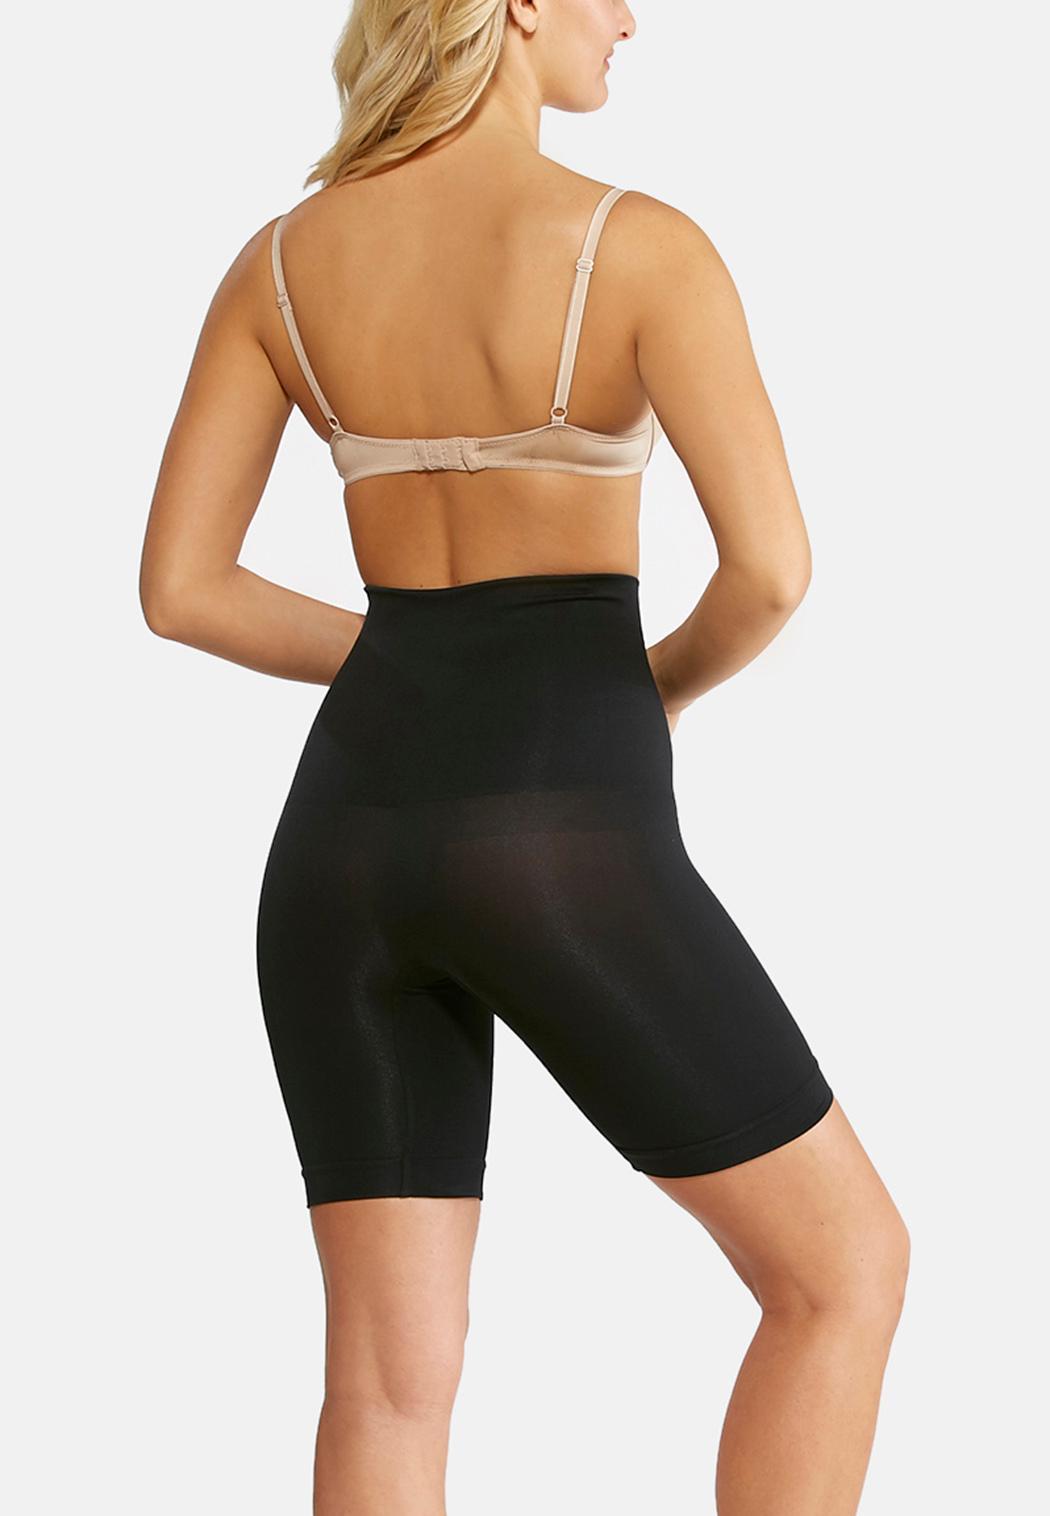 Black Seamless High Waist Shorts (Item #91895577)